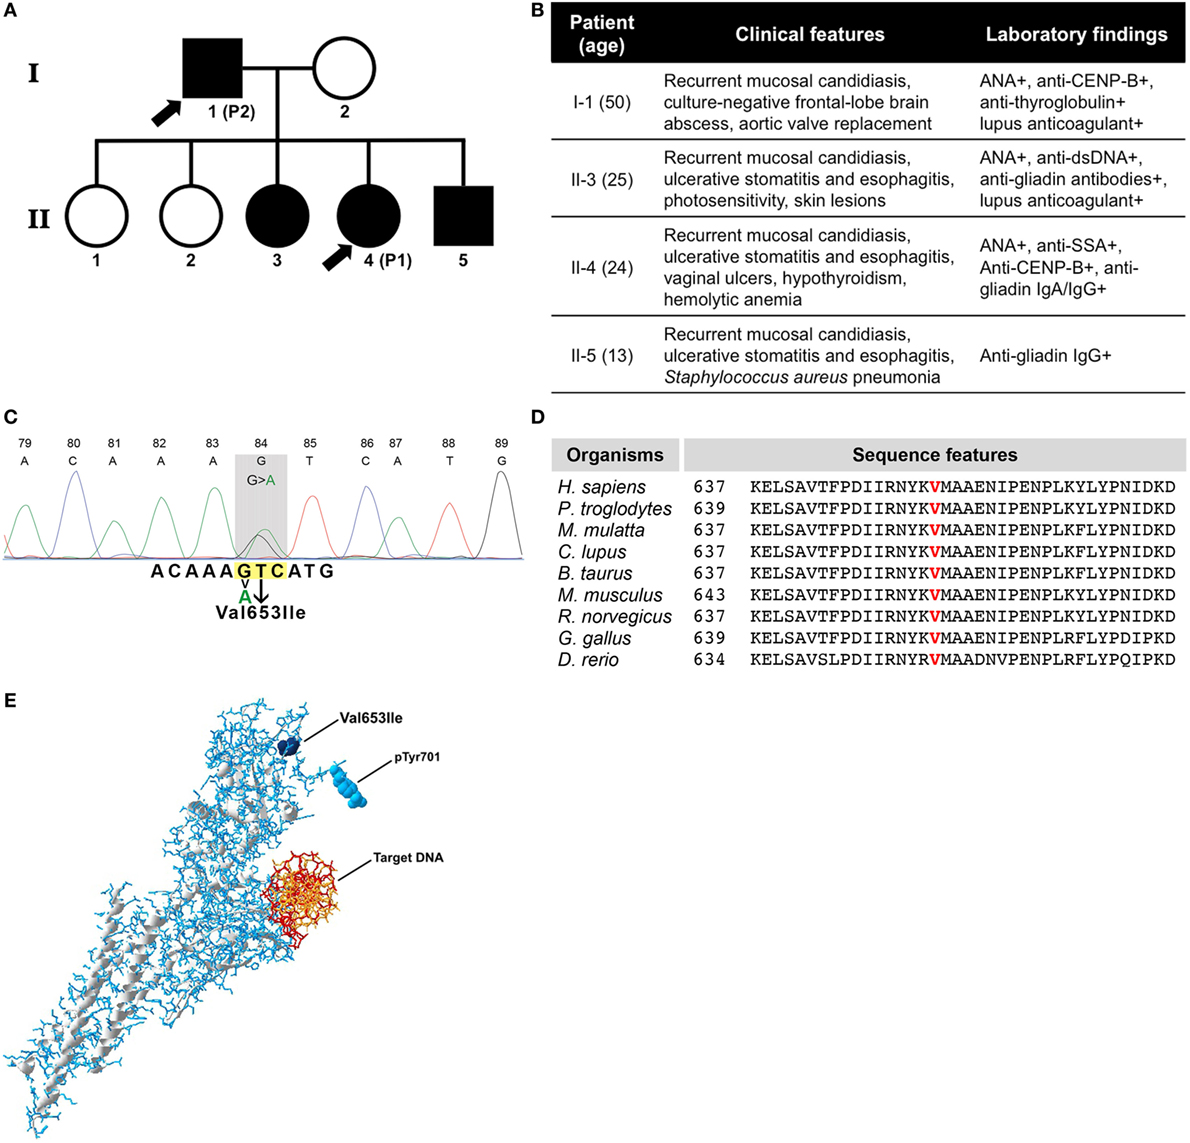 Frontiers | A Novel Heterozygous Mutation in the STAT1 SH2 Domain